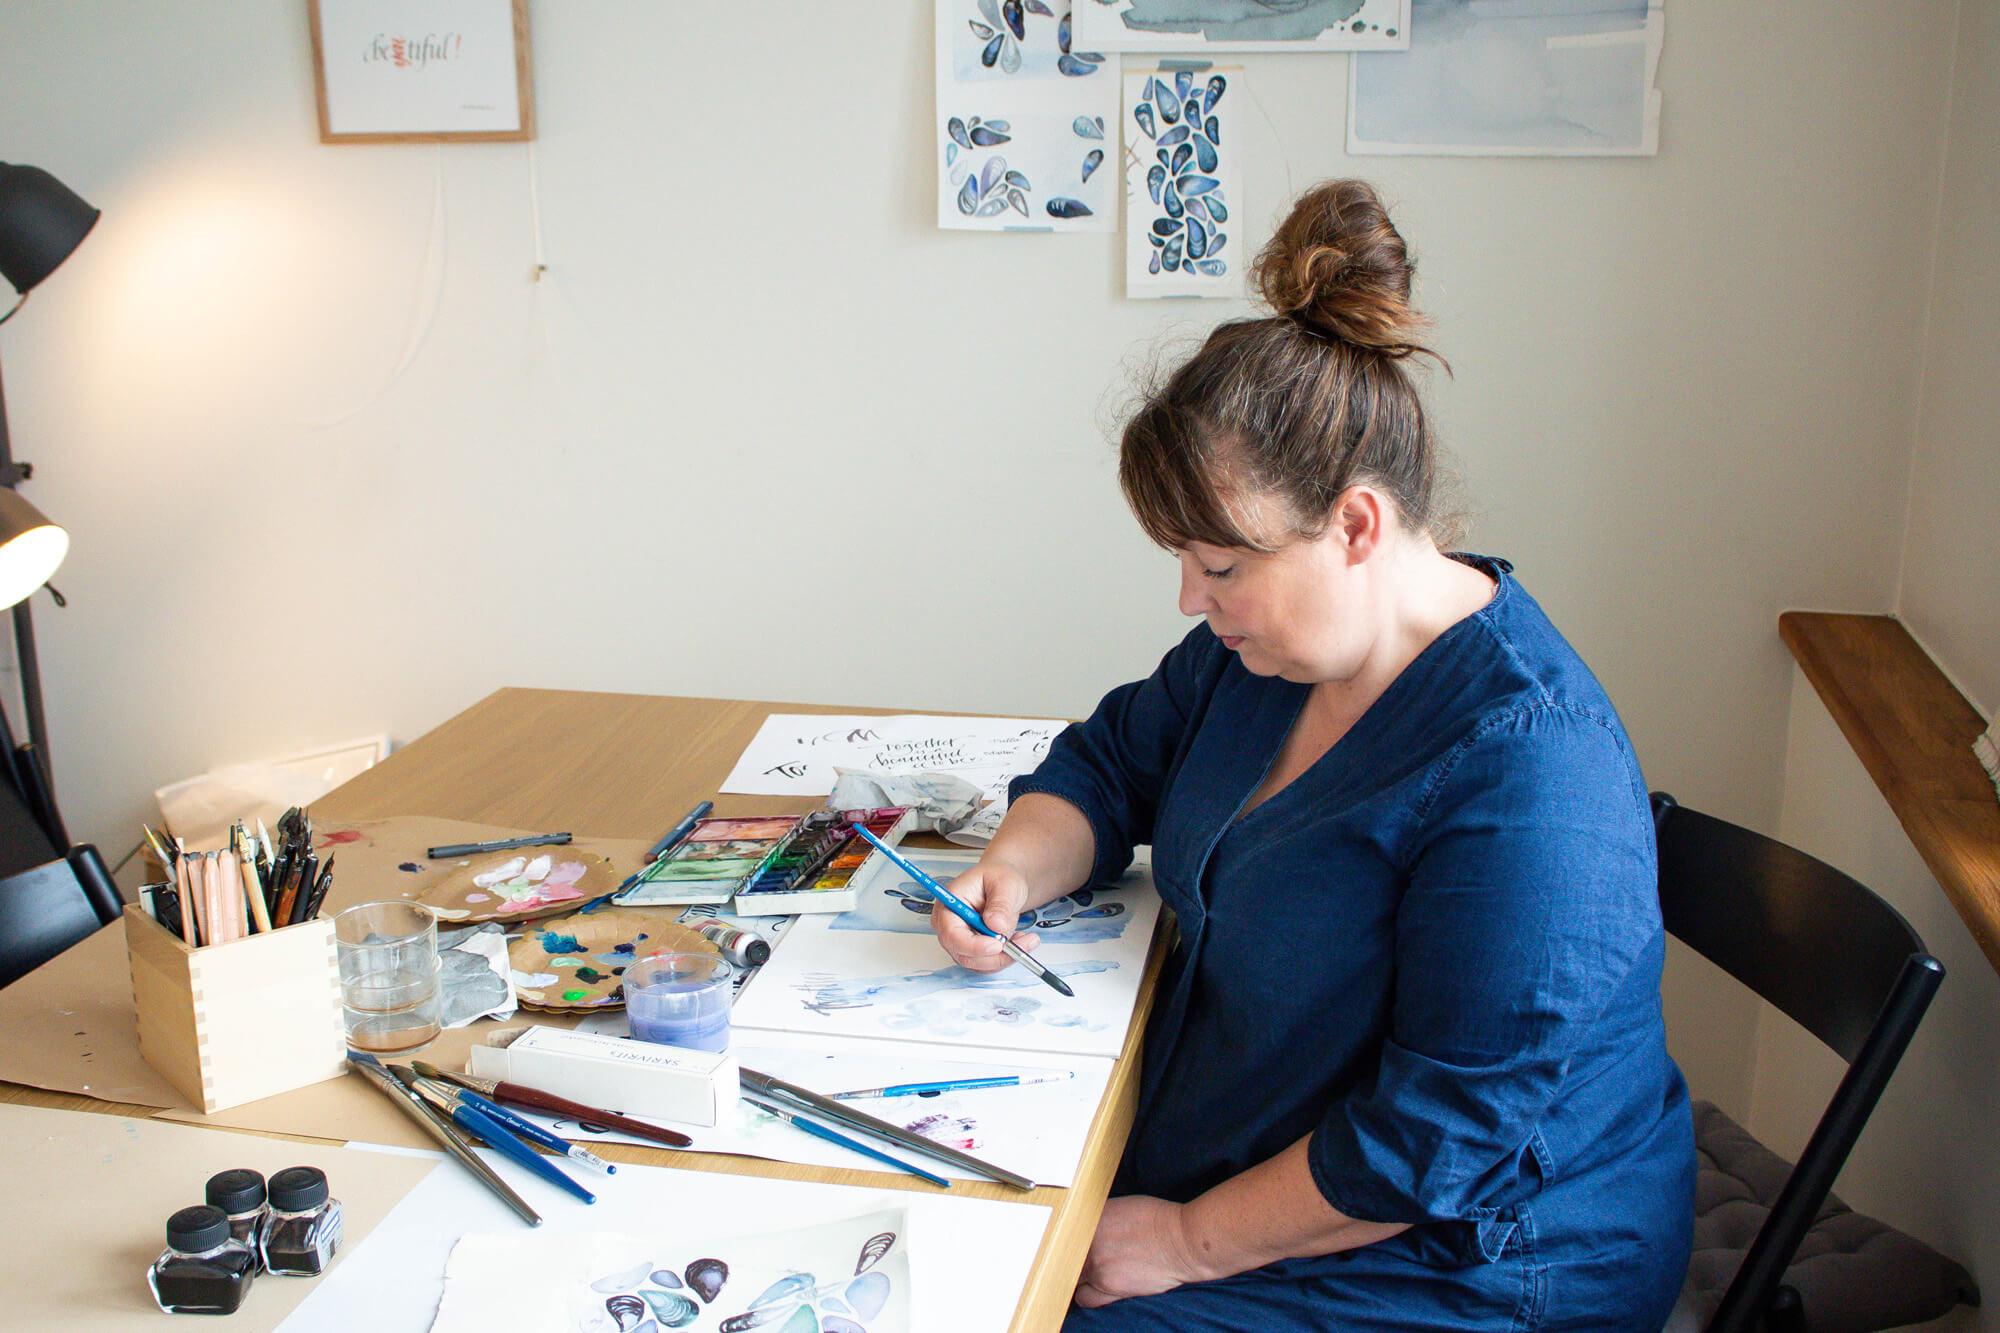 Foto: Angelica Sörquist, Studio Isla